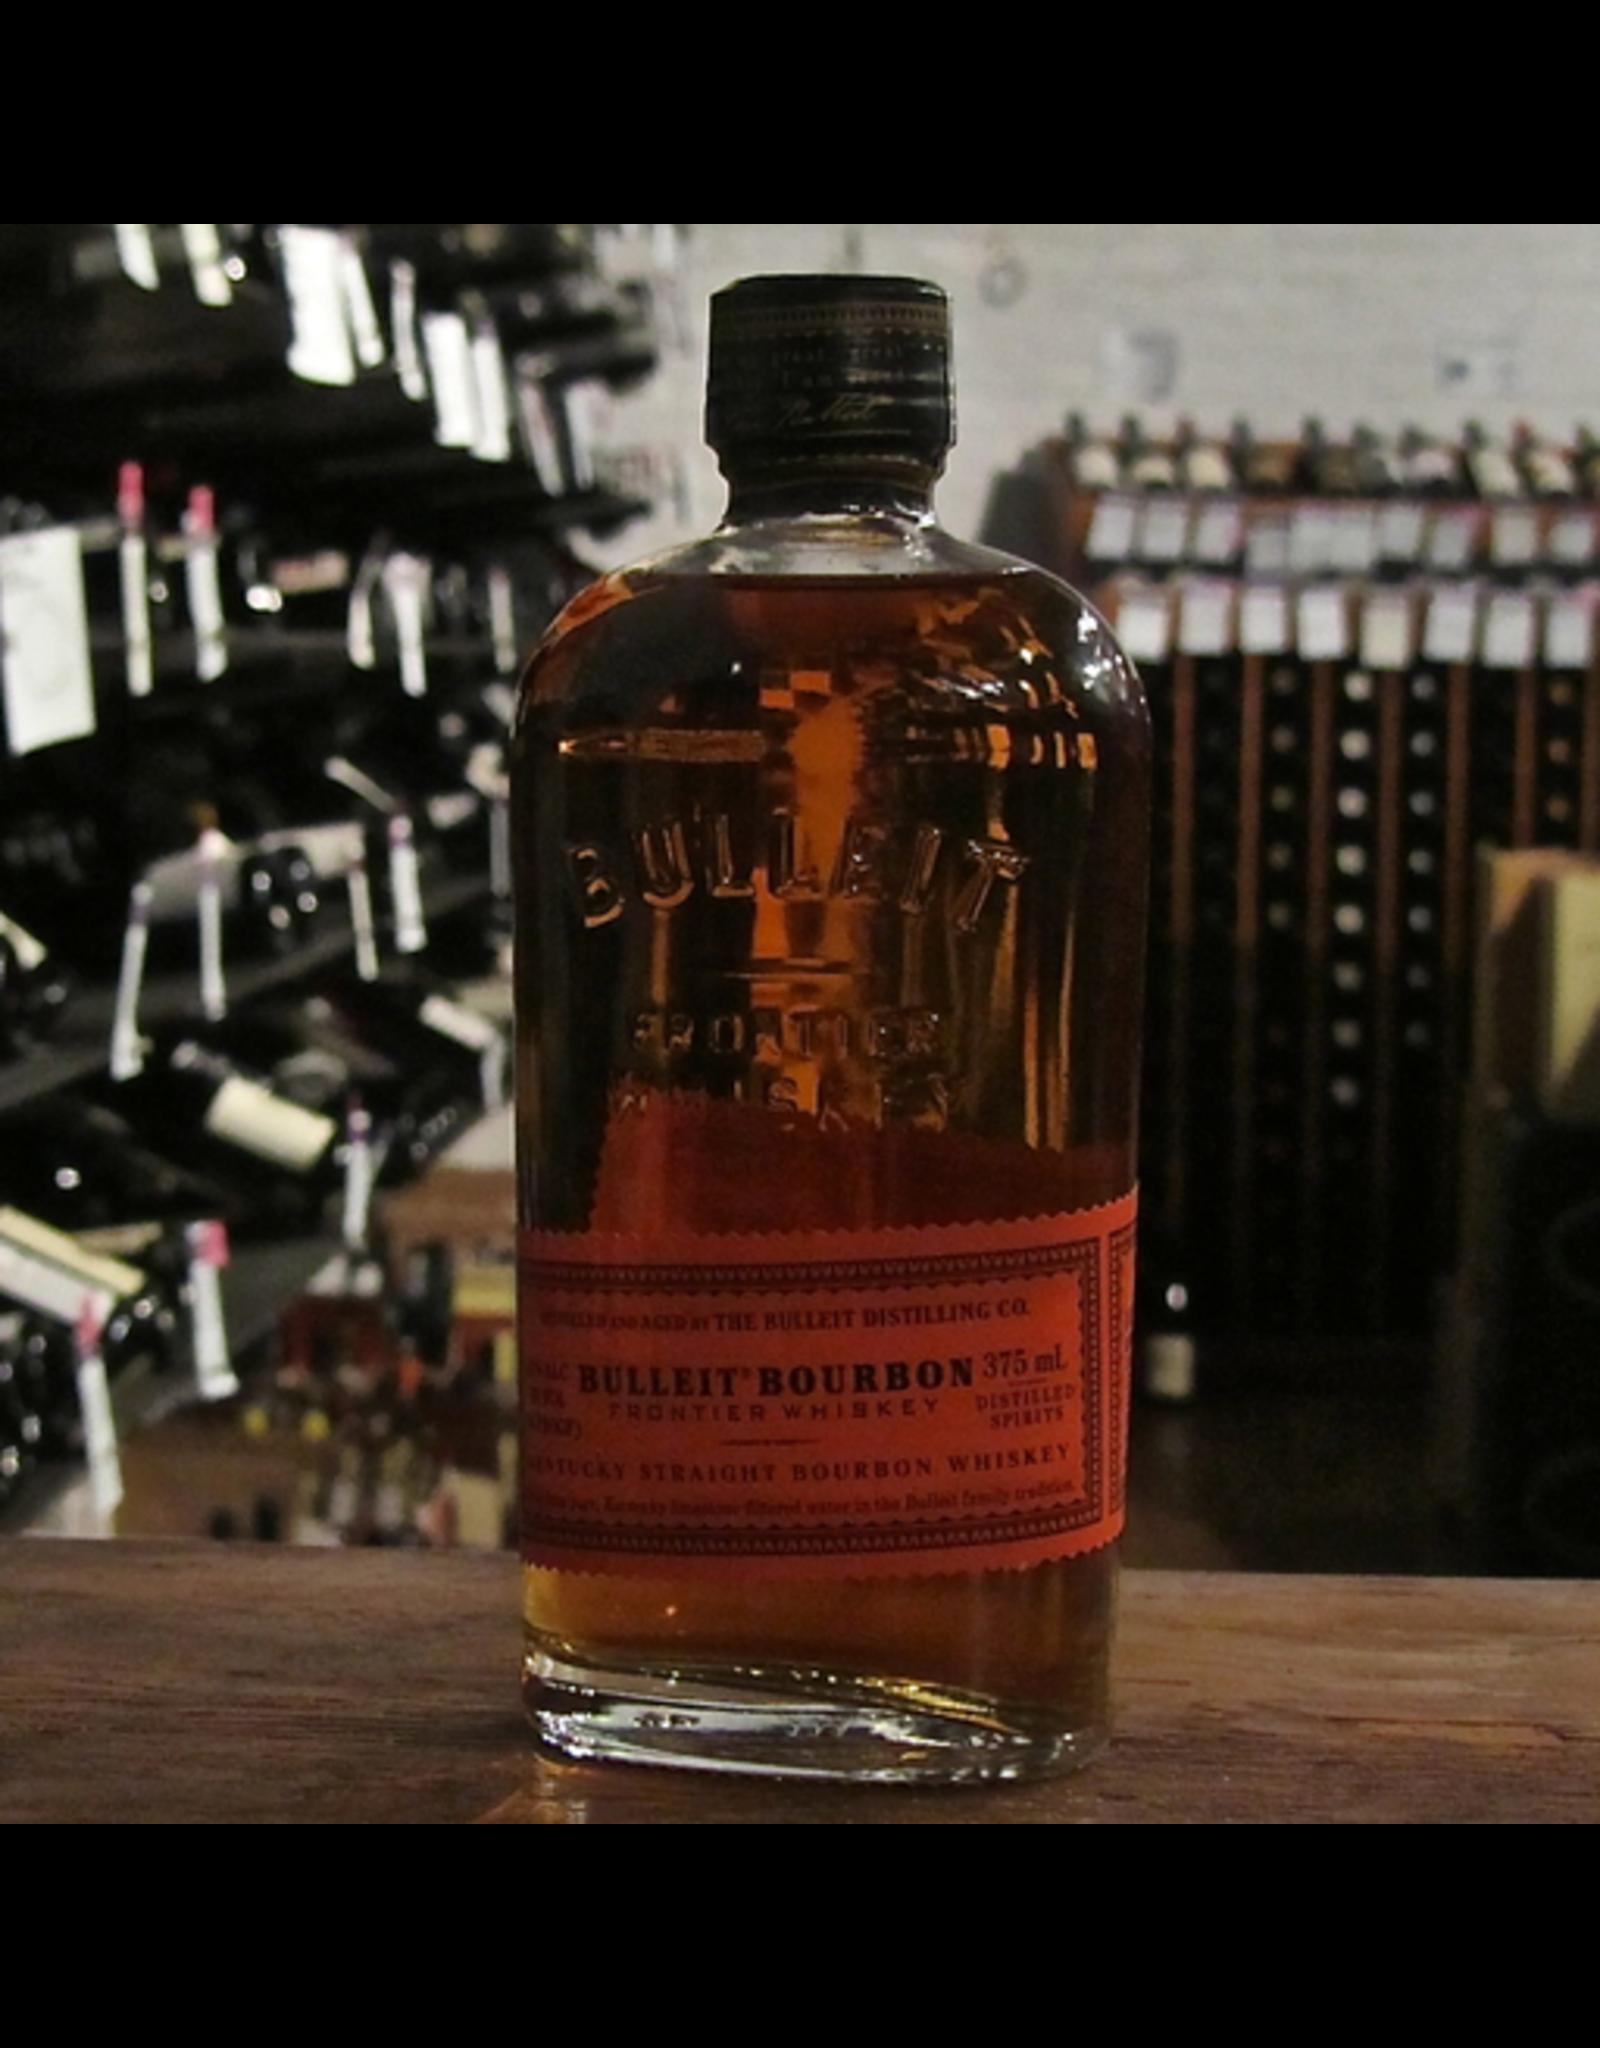 Bulleit Straight Bourbon Frontier Whiskey - Lawrenceburg, KY [375ml]